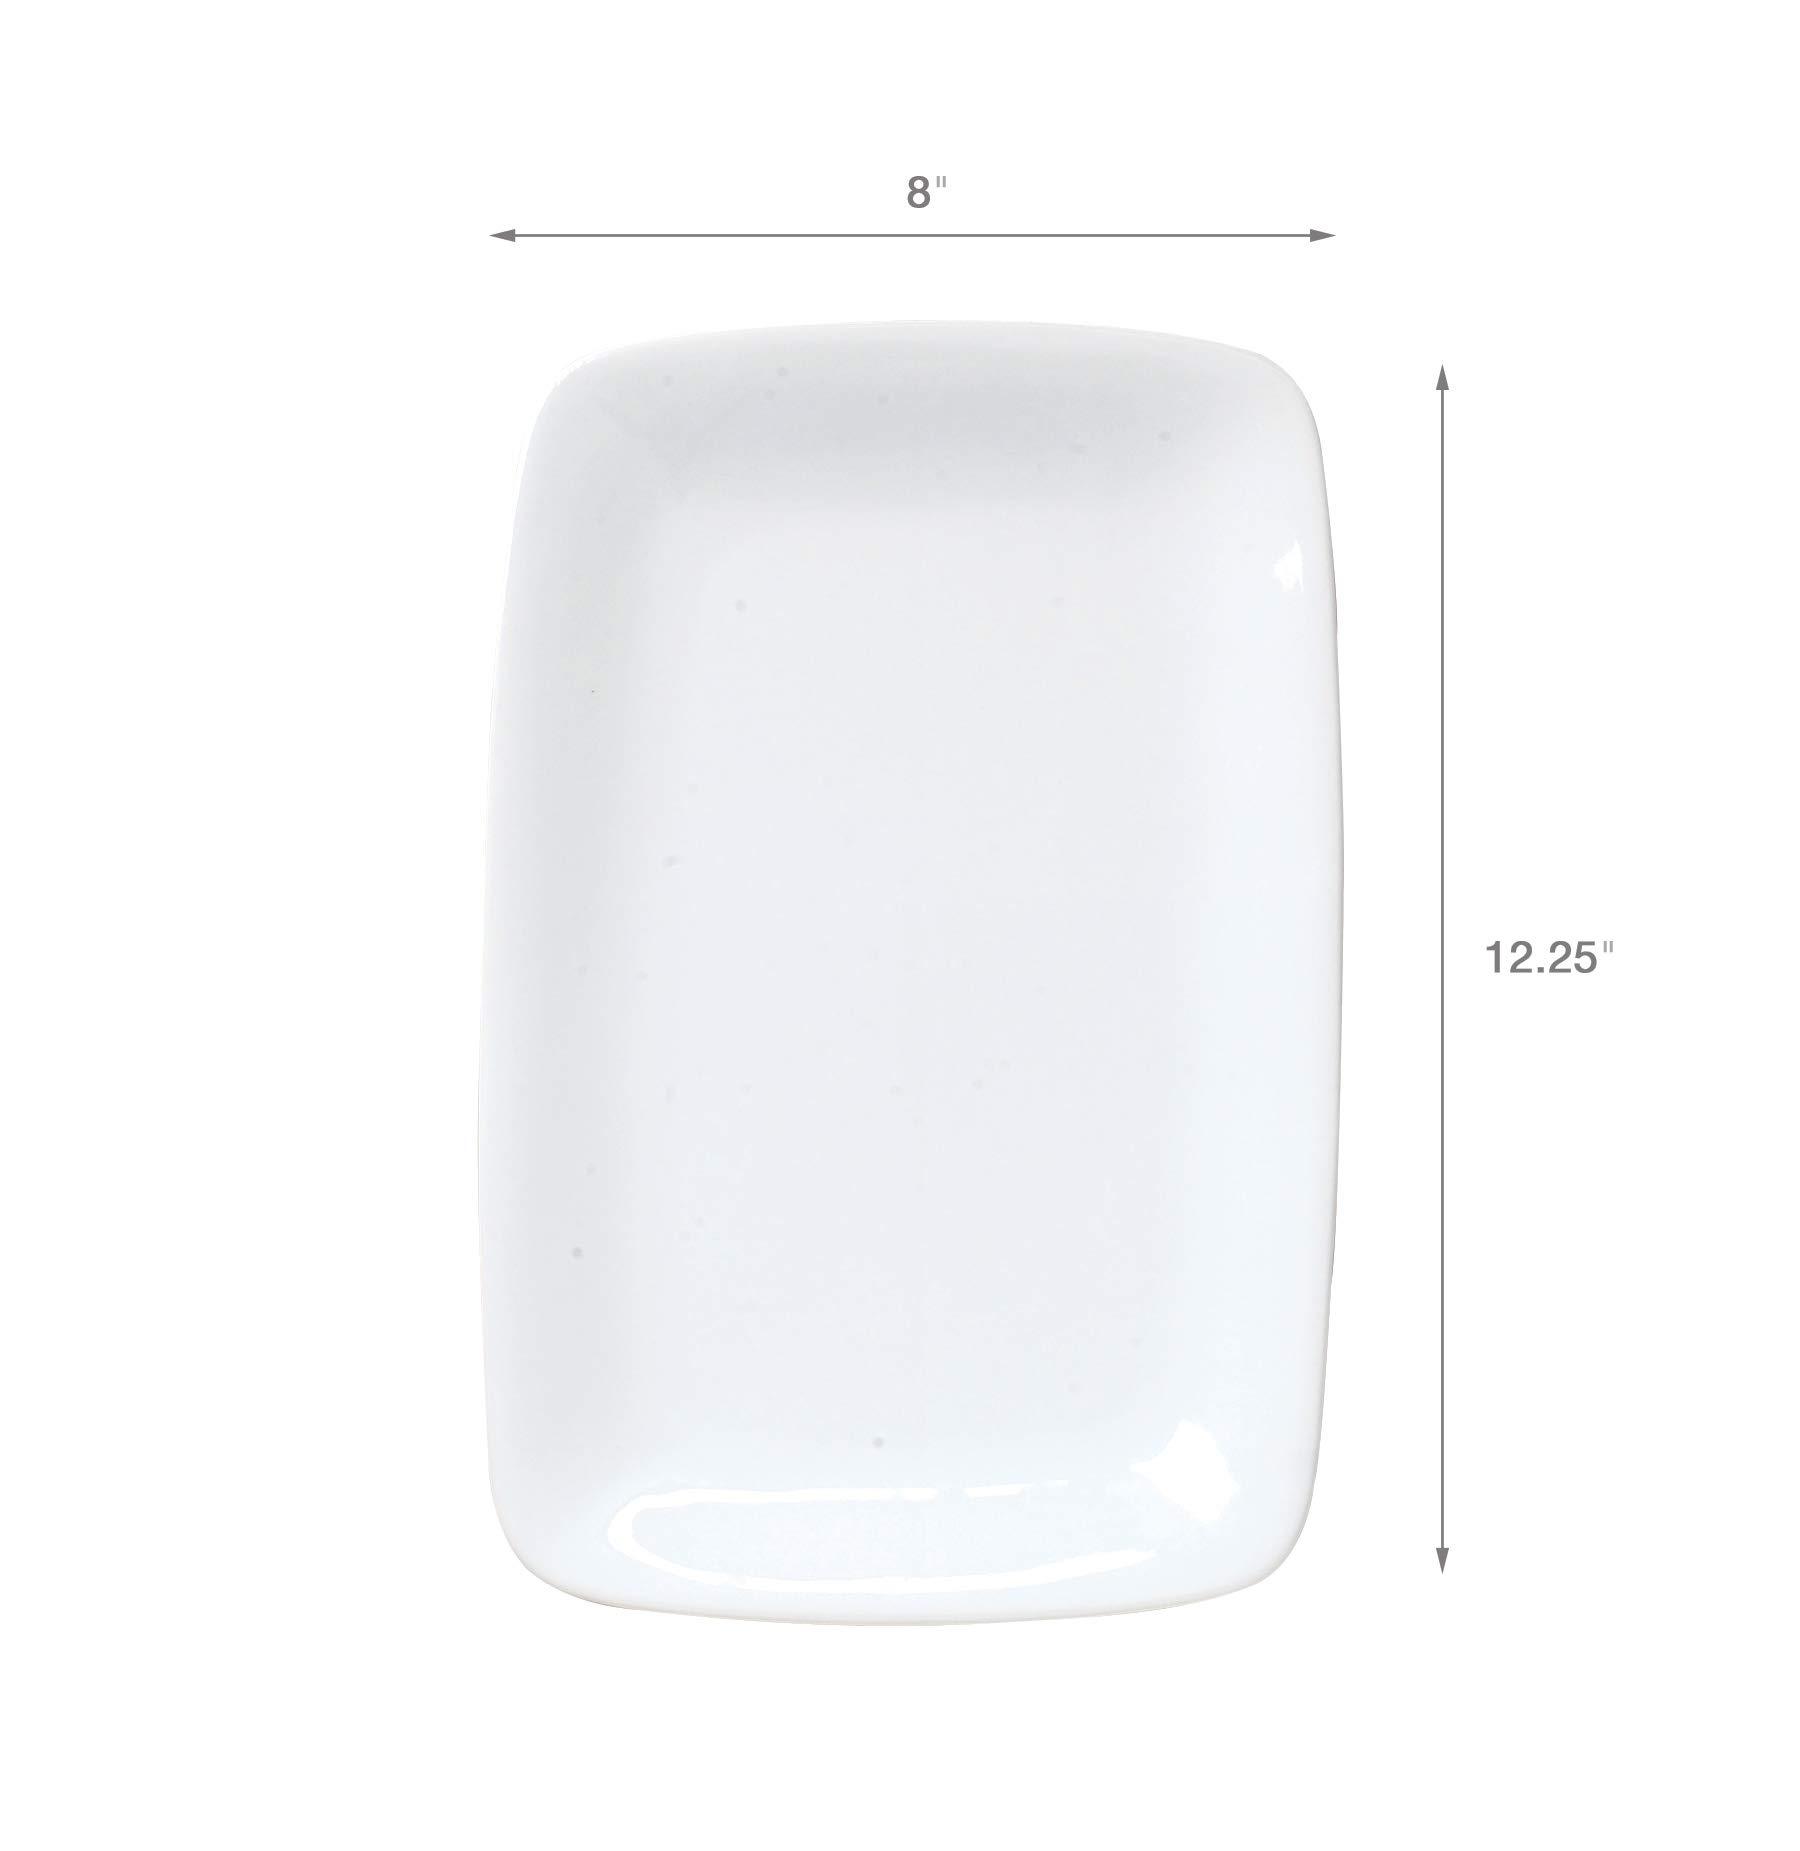 HIC Harold Import Co. HIC Porcelain Rectangle Platter 12.5-Inch, White